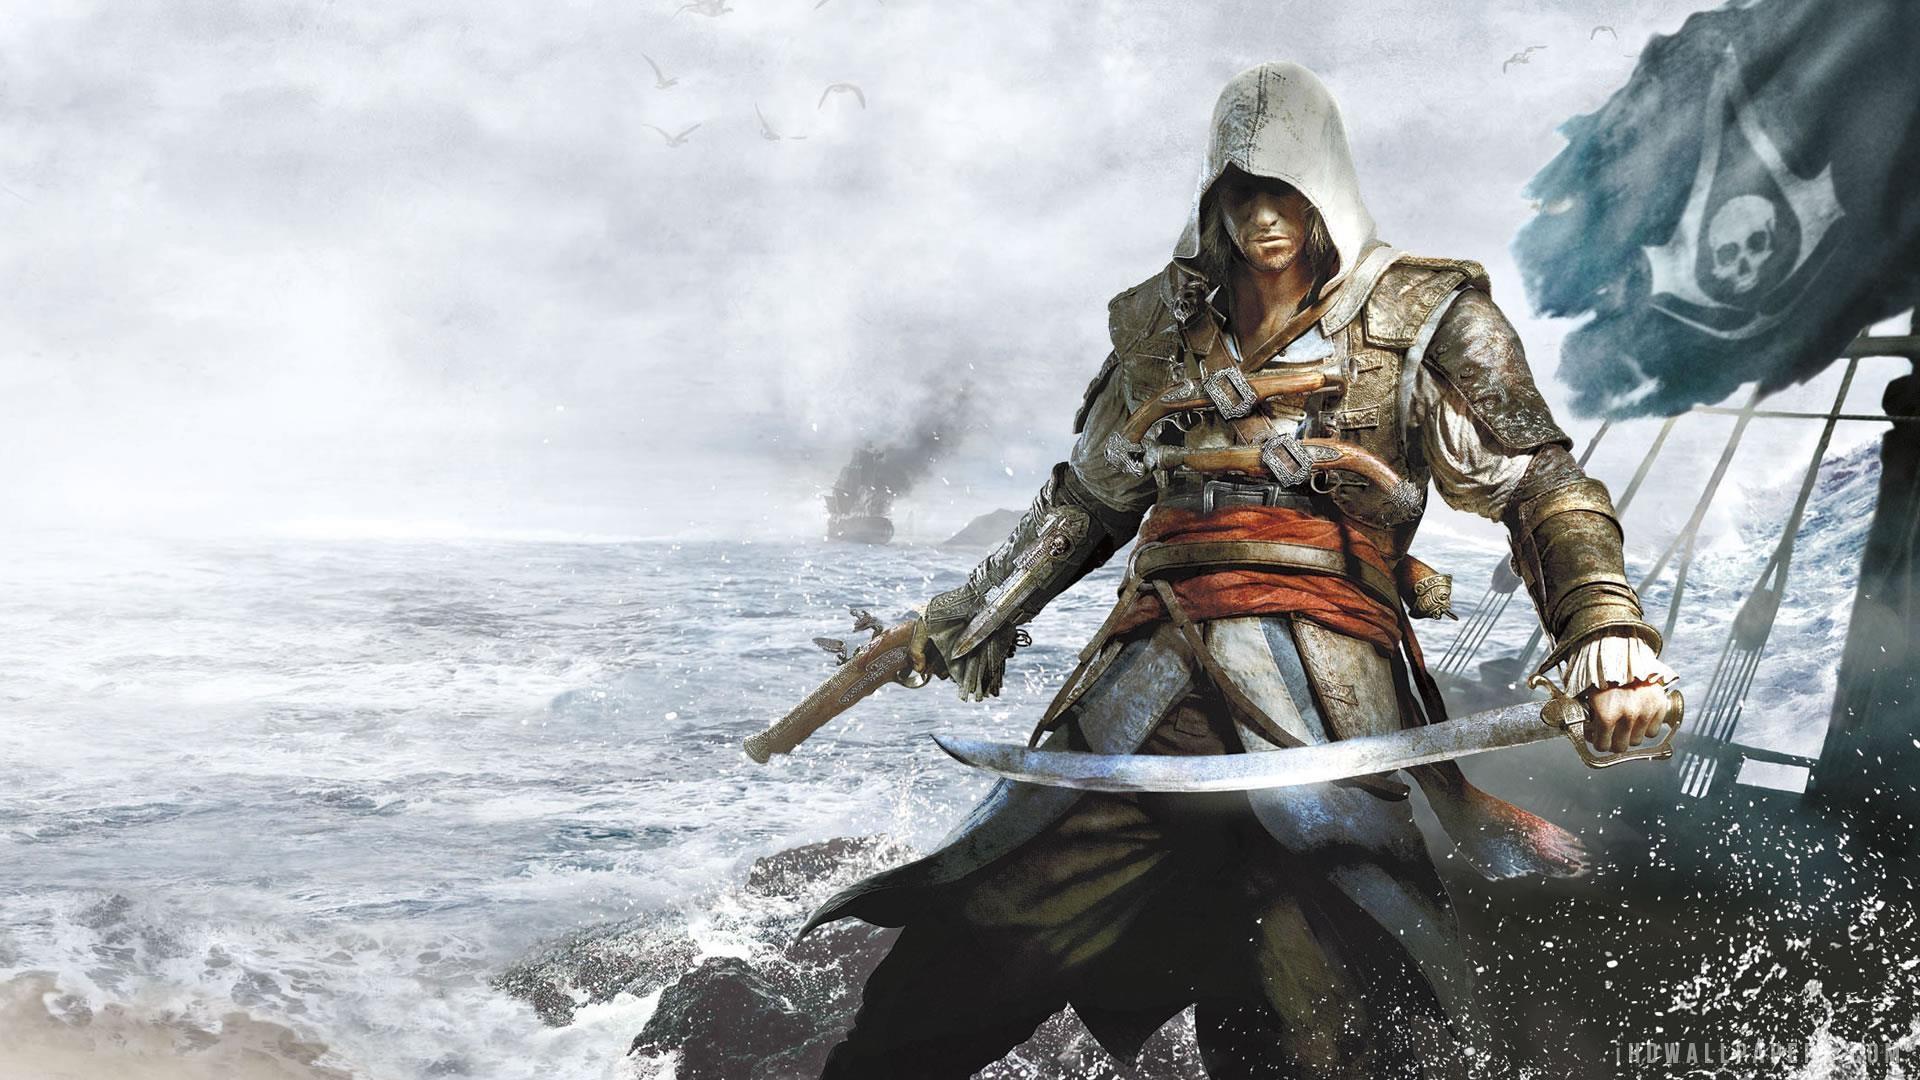 Assassins Creed 4 HD Wallpaper   iHD Wallpapers 1920x1080